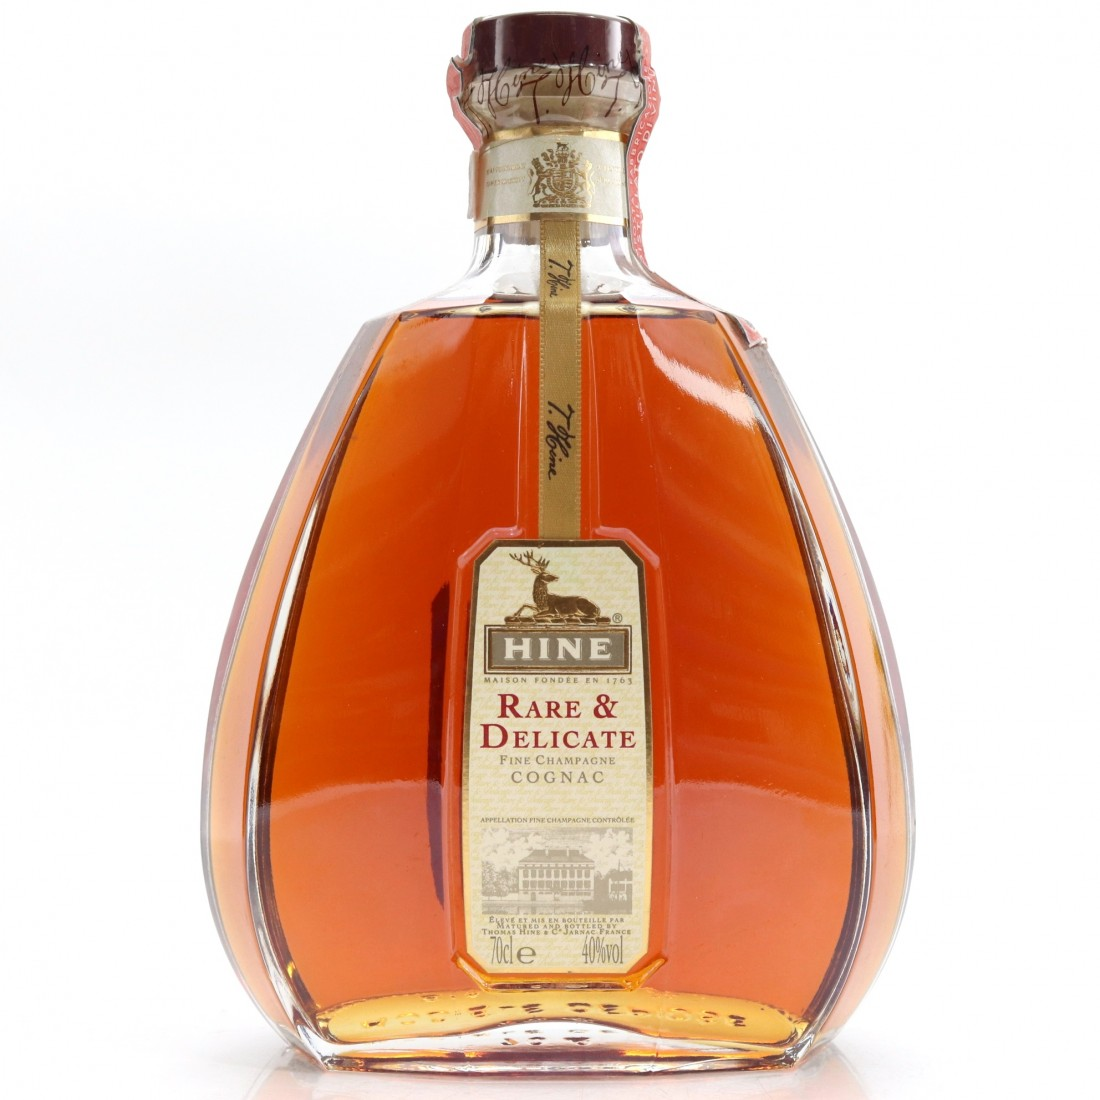 Hine Rare and Delicate Cognac